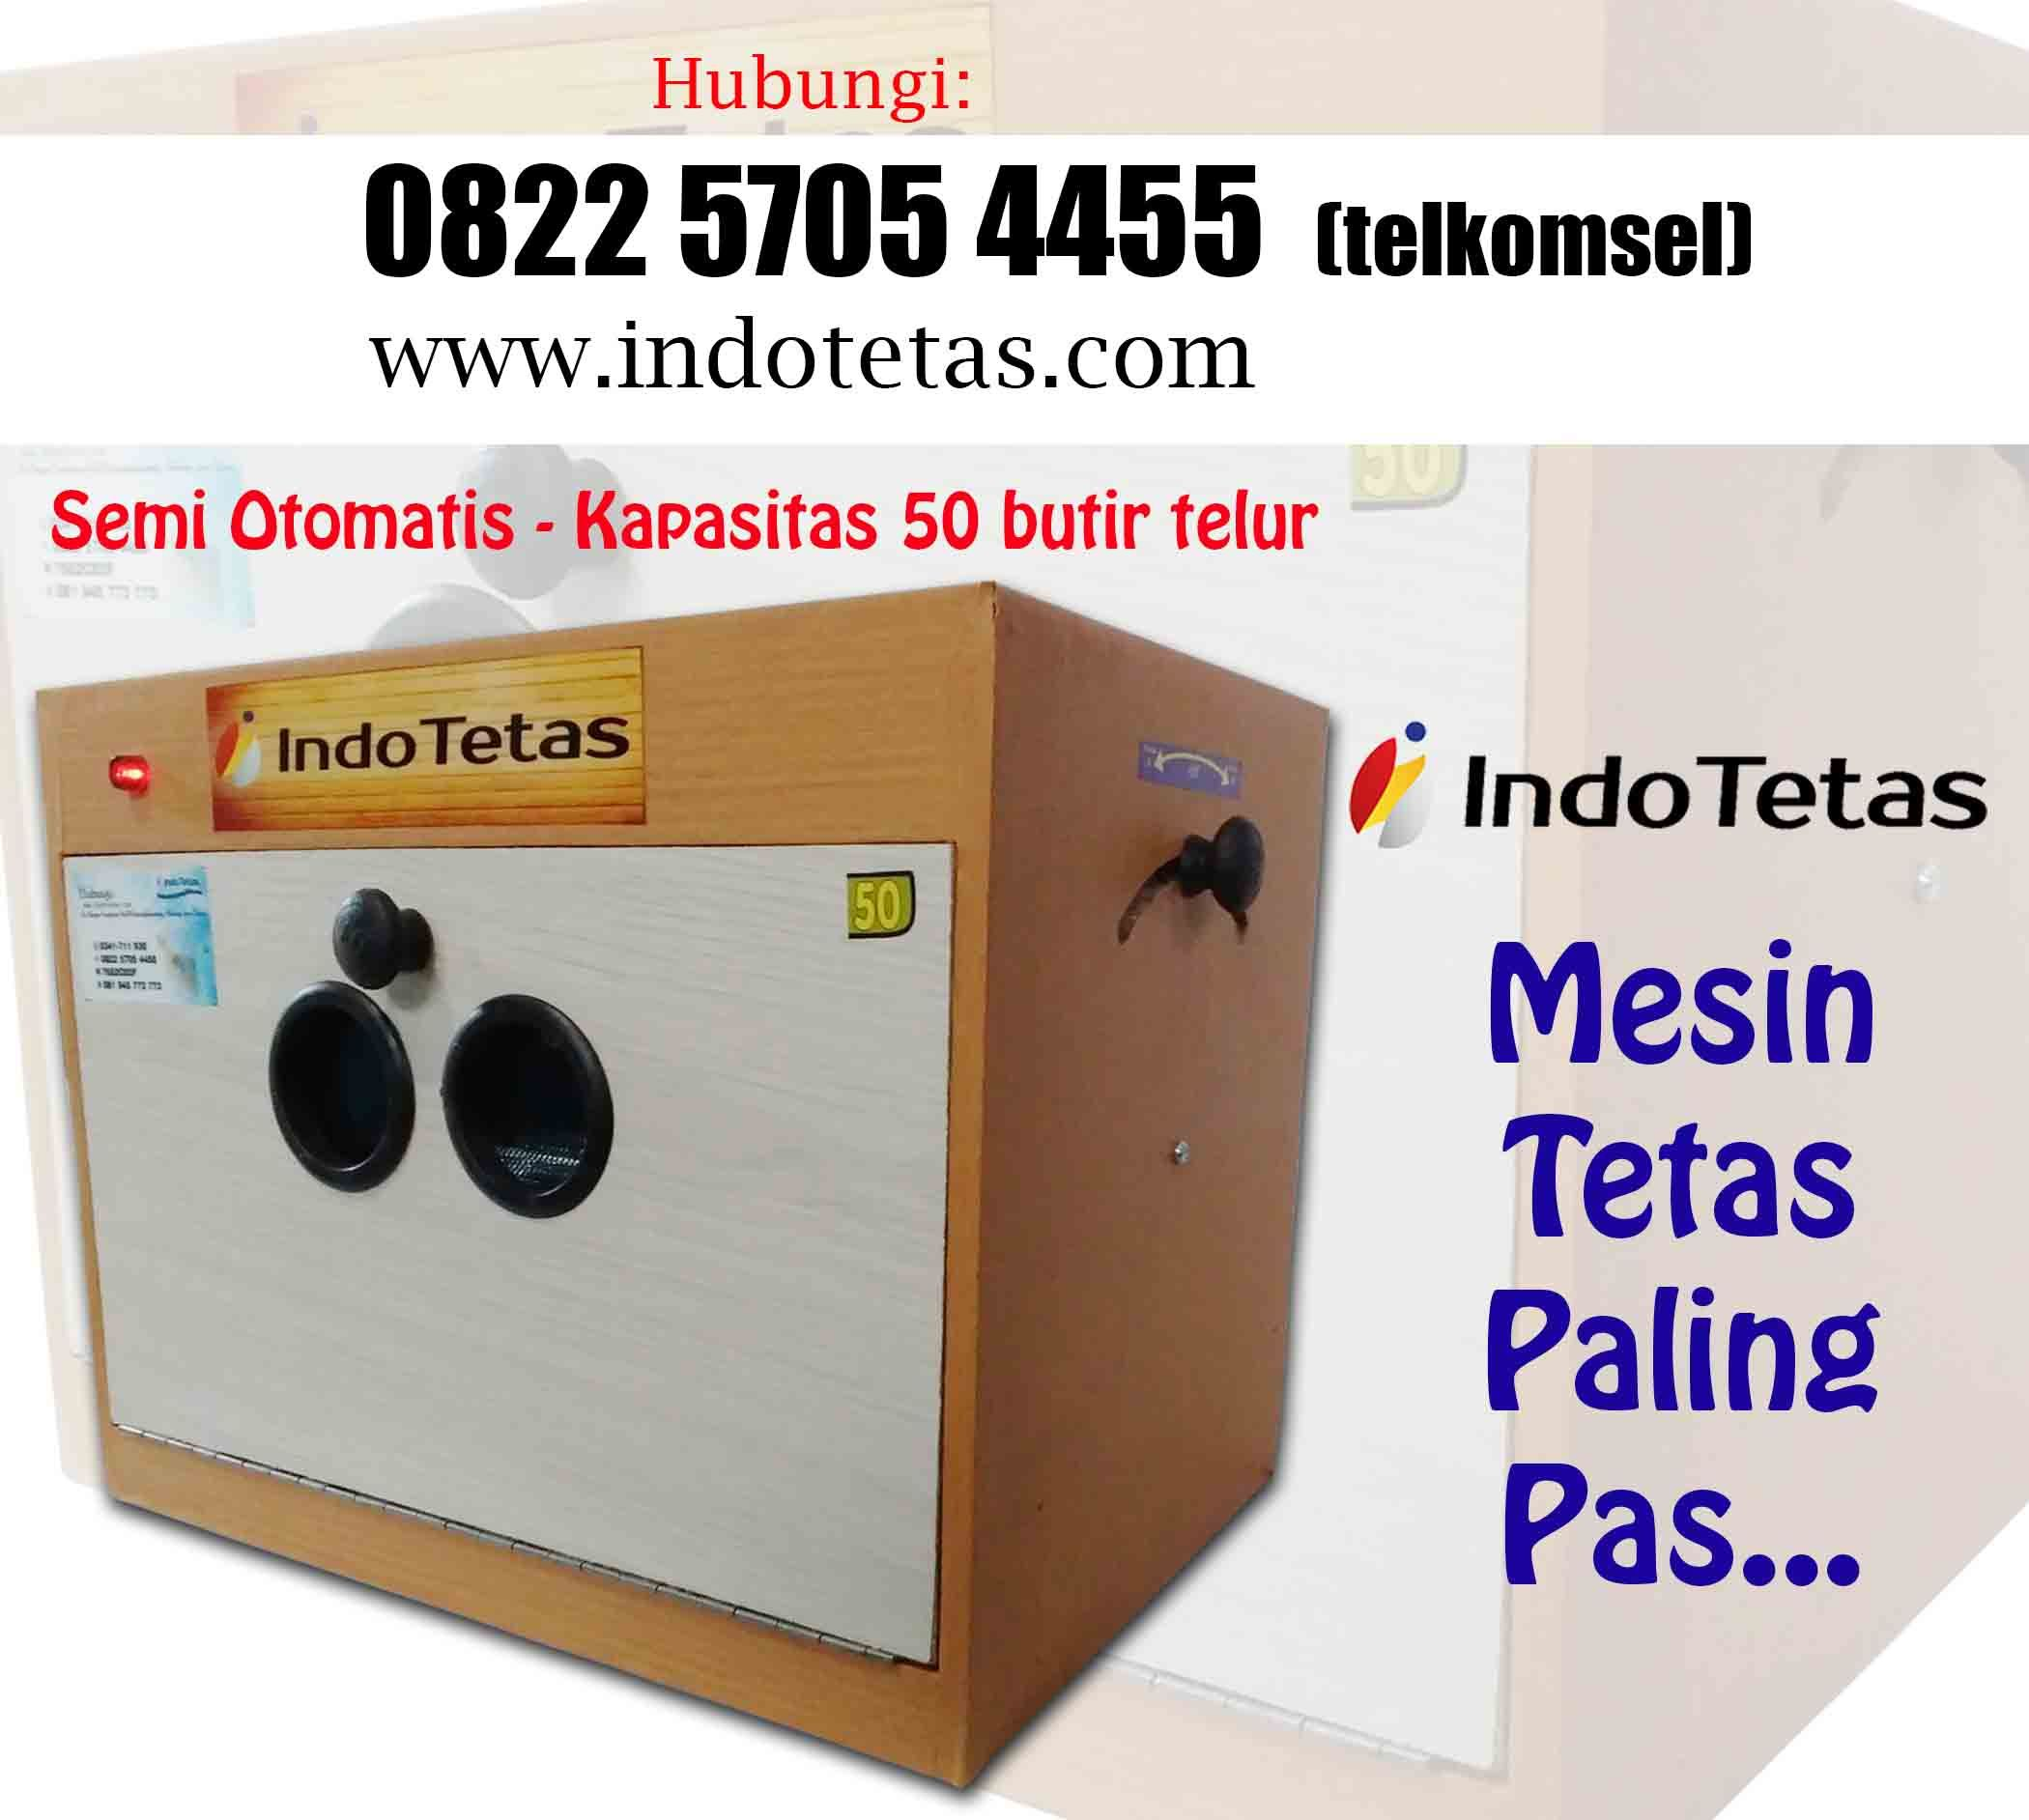 Beli Alat Penetas Telur Bebek Beli Mesin Penetas Telur Di Jakarta Beli Thermostat Buat Penetas Telur Bentuk Mesin Penetas Telur Iti Telur Lampu Minyak Bebek